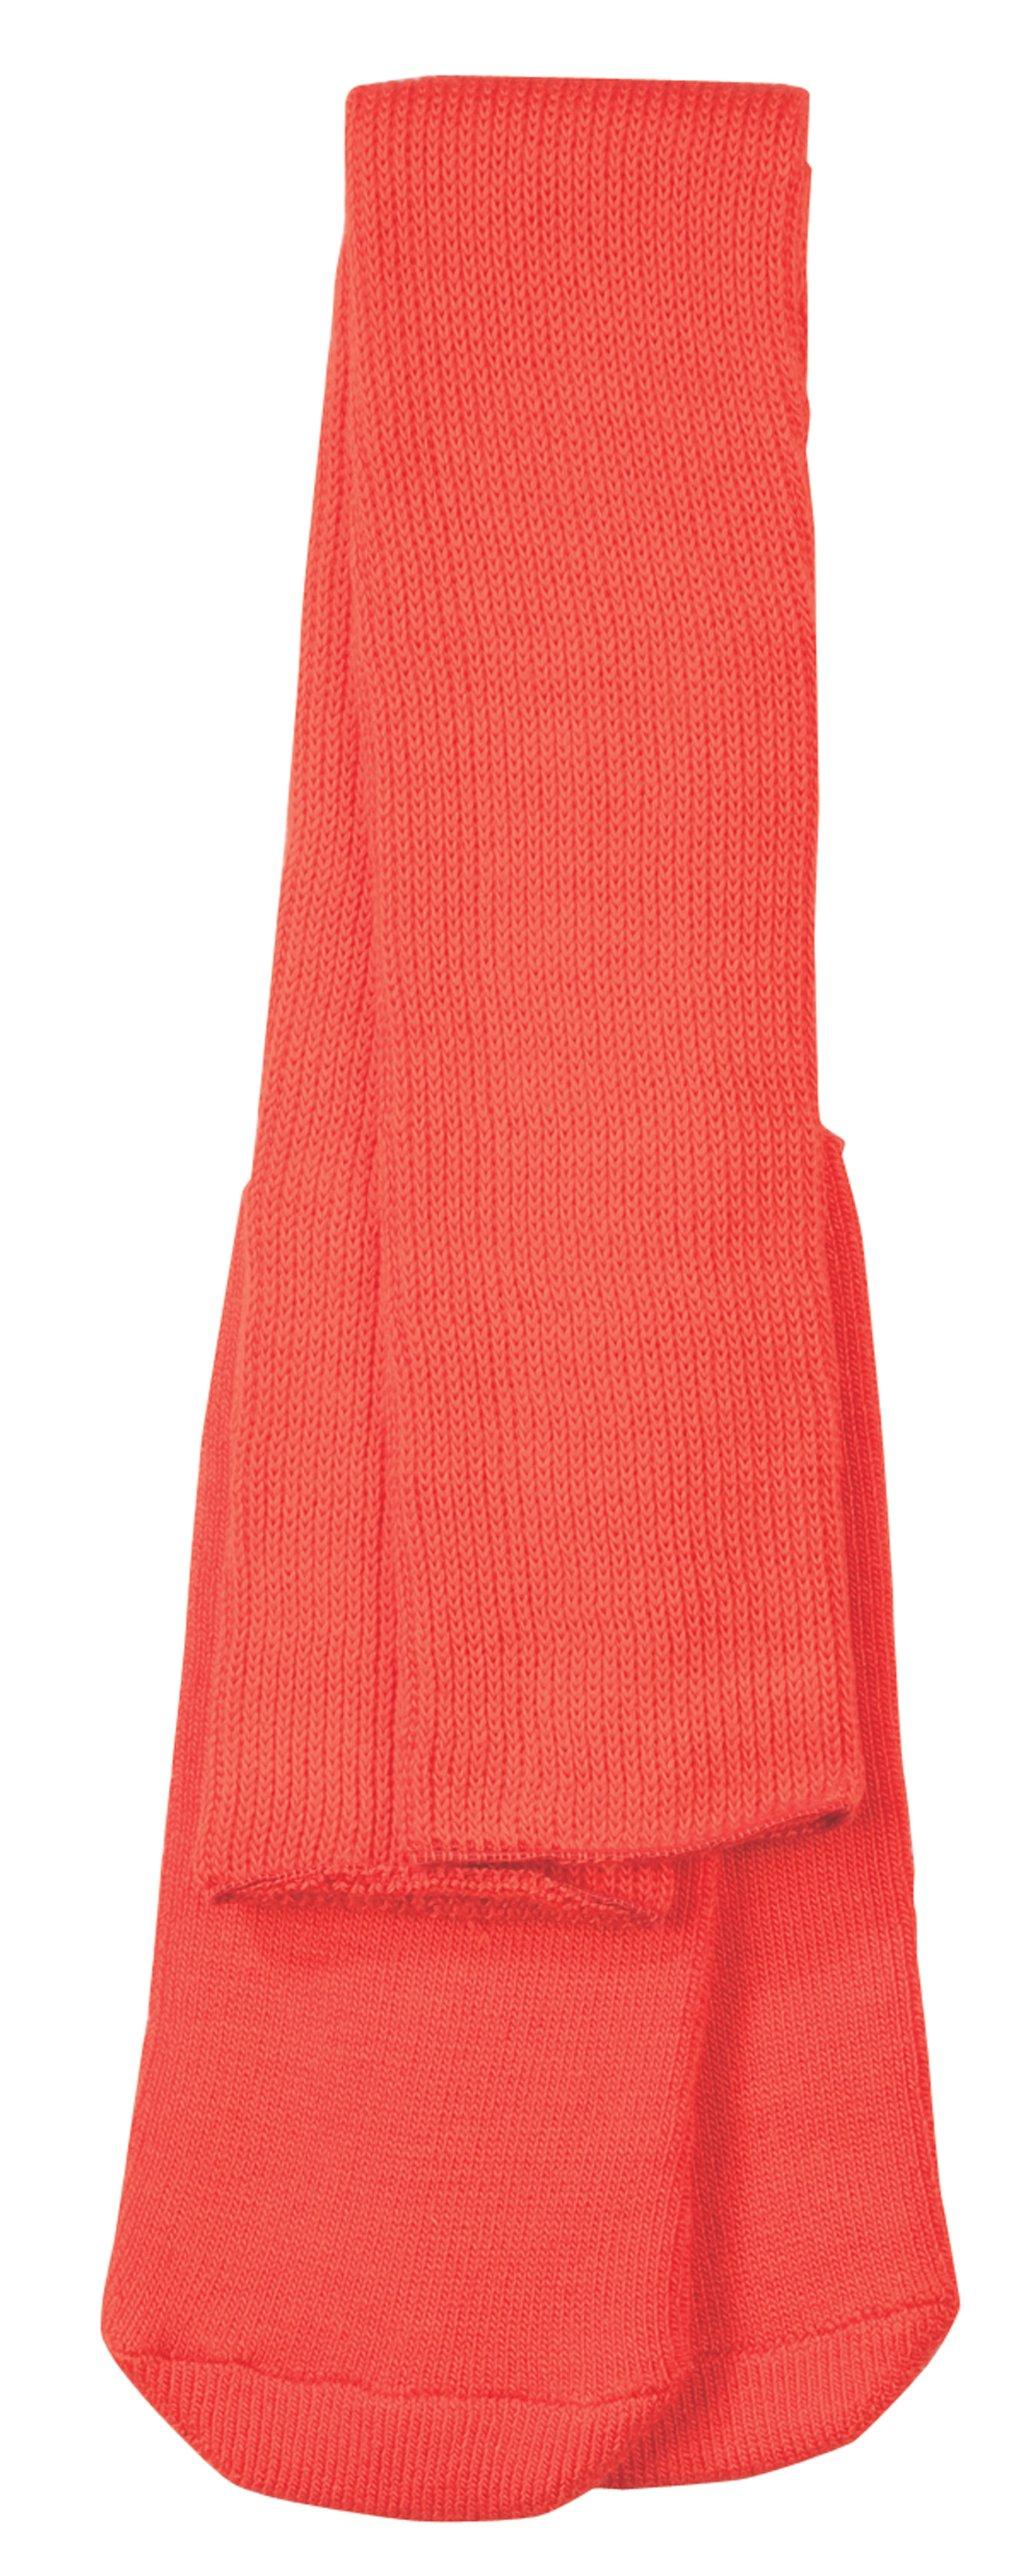 Markwort Soccer Socks-Pair of 6, Youth, Orange by Markwort